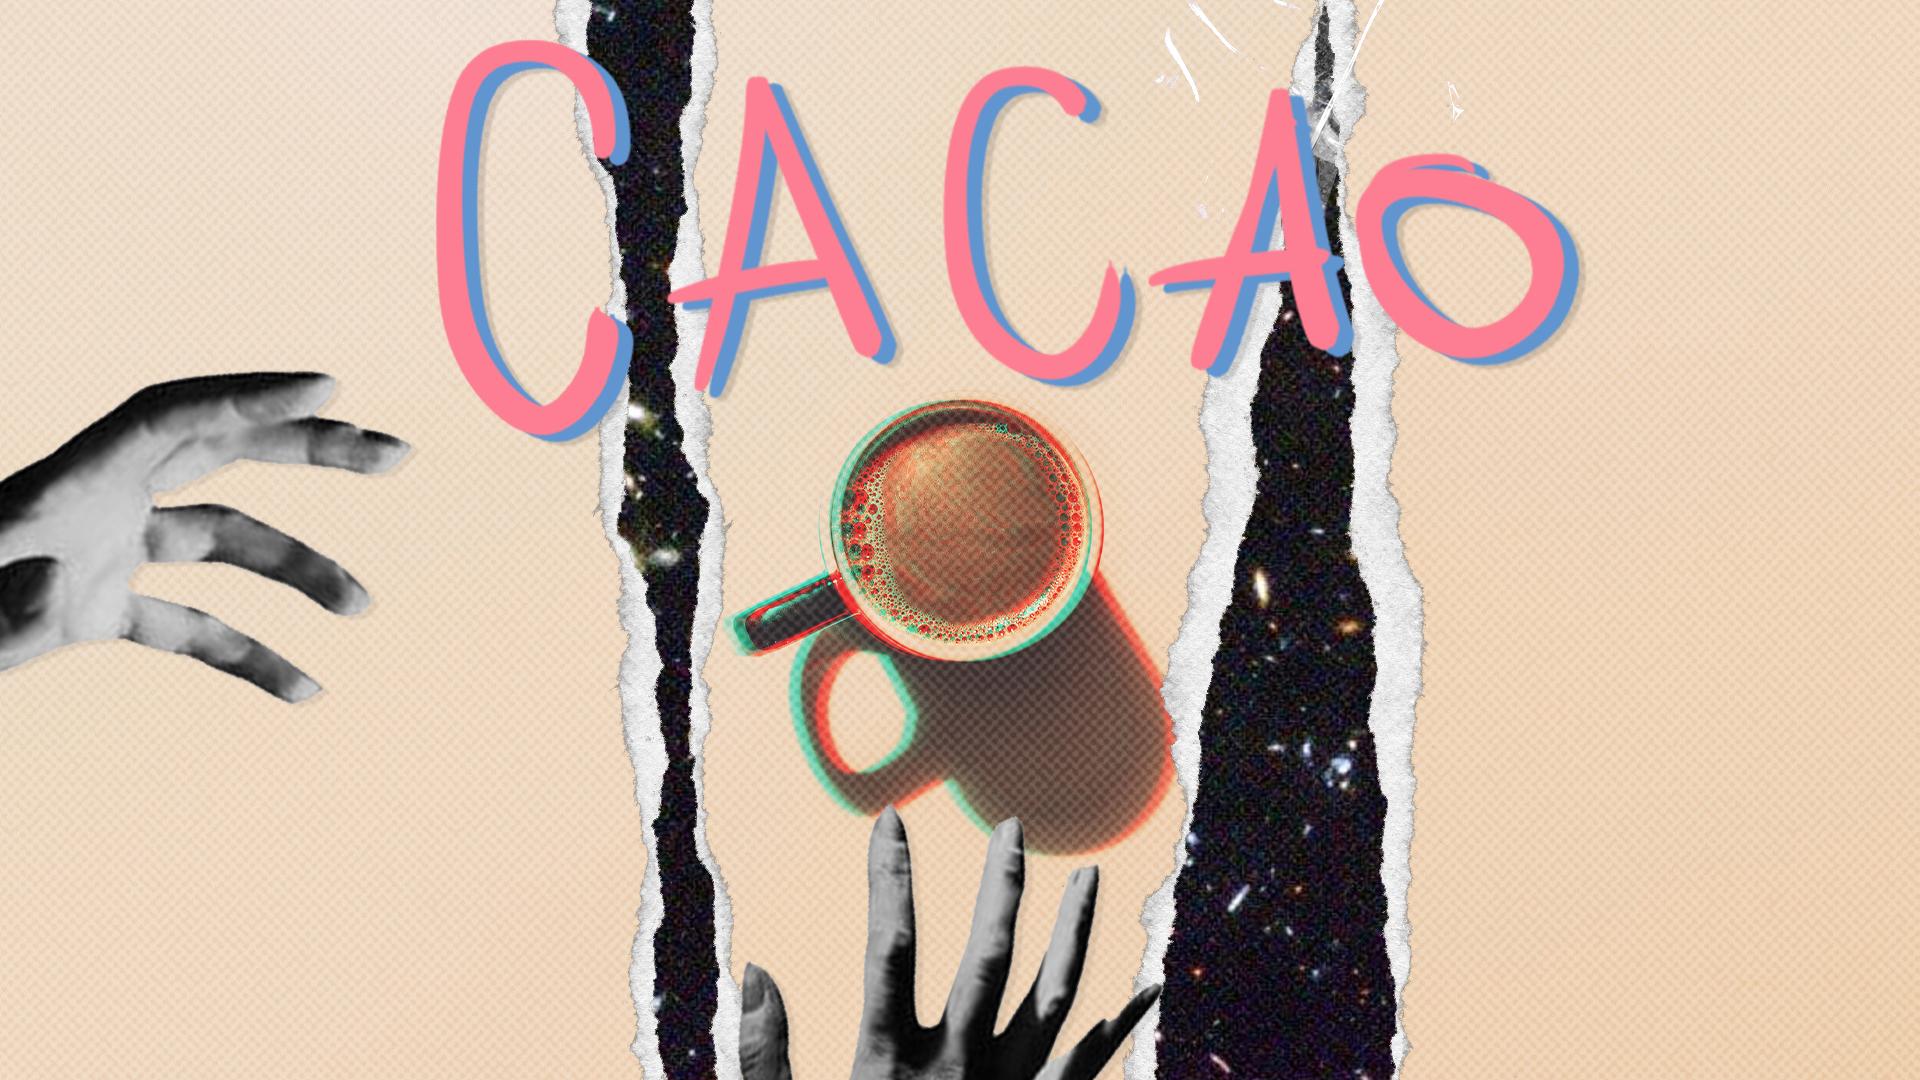 Cacao Ceremonie